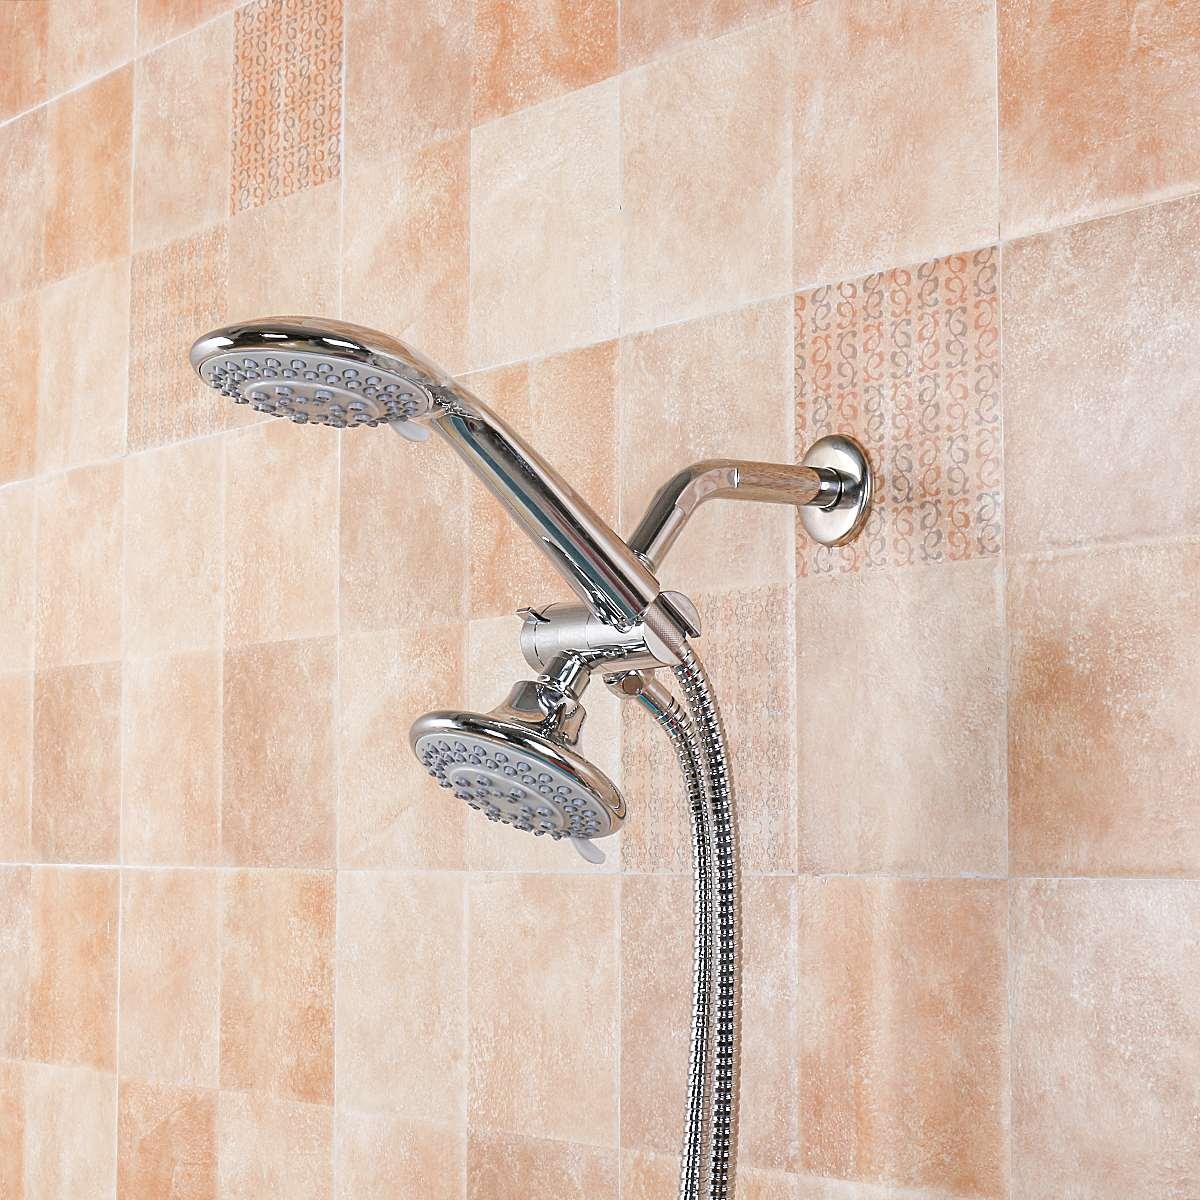 2 Mode Rainfall Shower Head/Handheld Combo Chrome Shower Head Set + ...